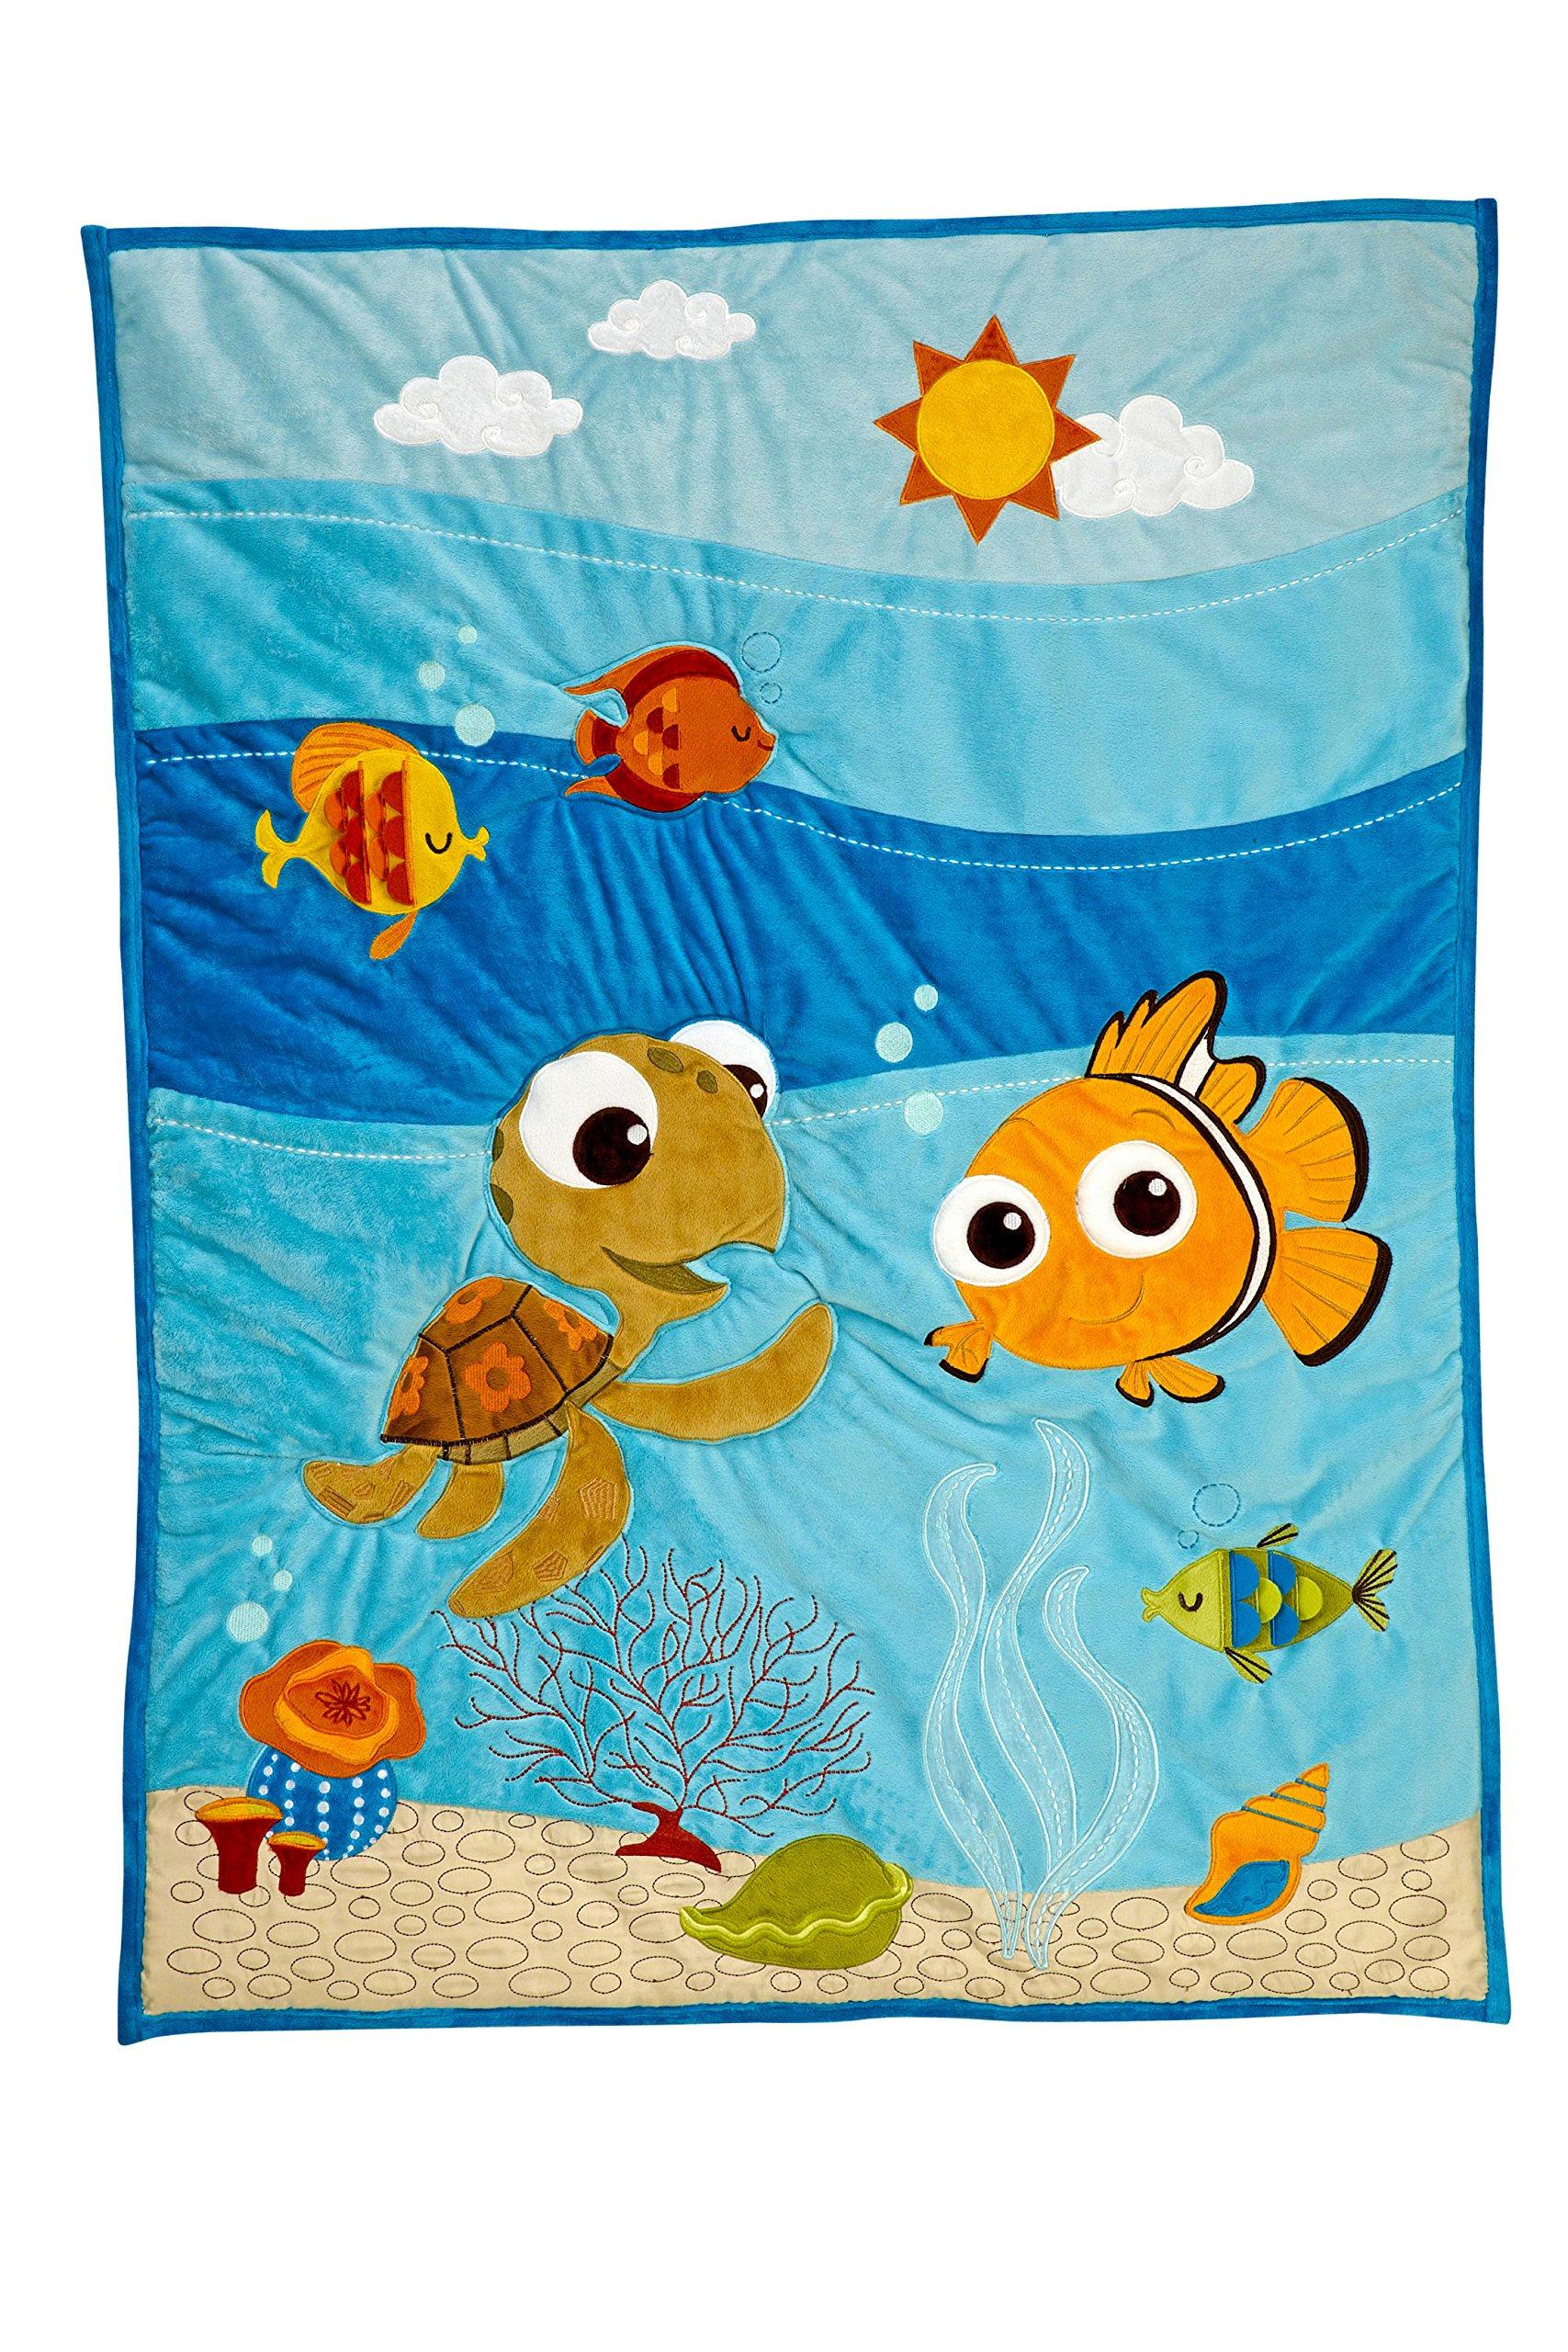 Disney Finding Nemo Applique Luxury Quilt (Crib Comforter Only) by Disney